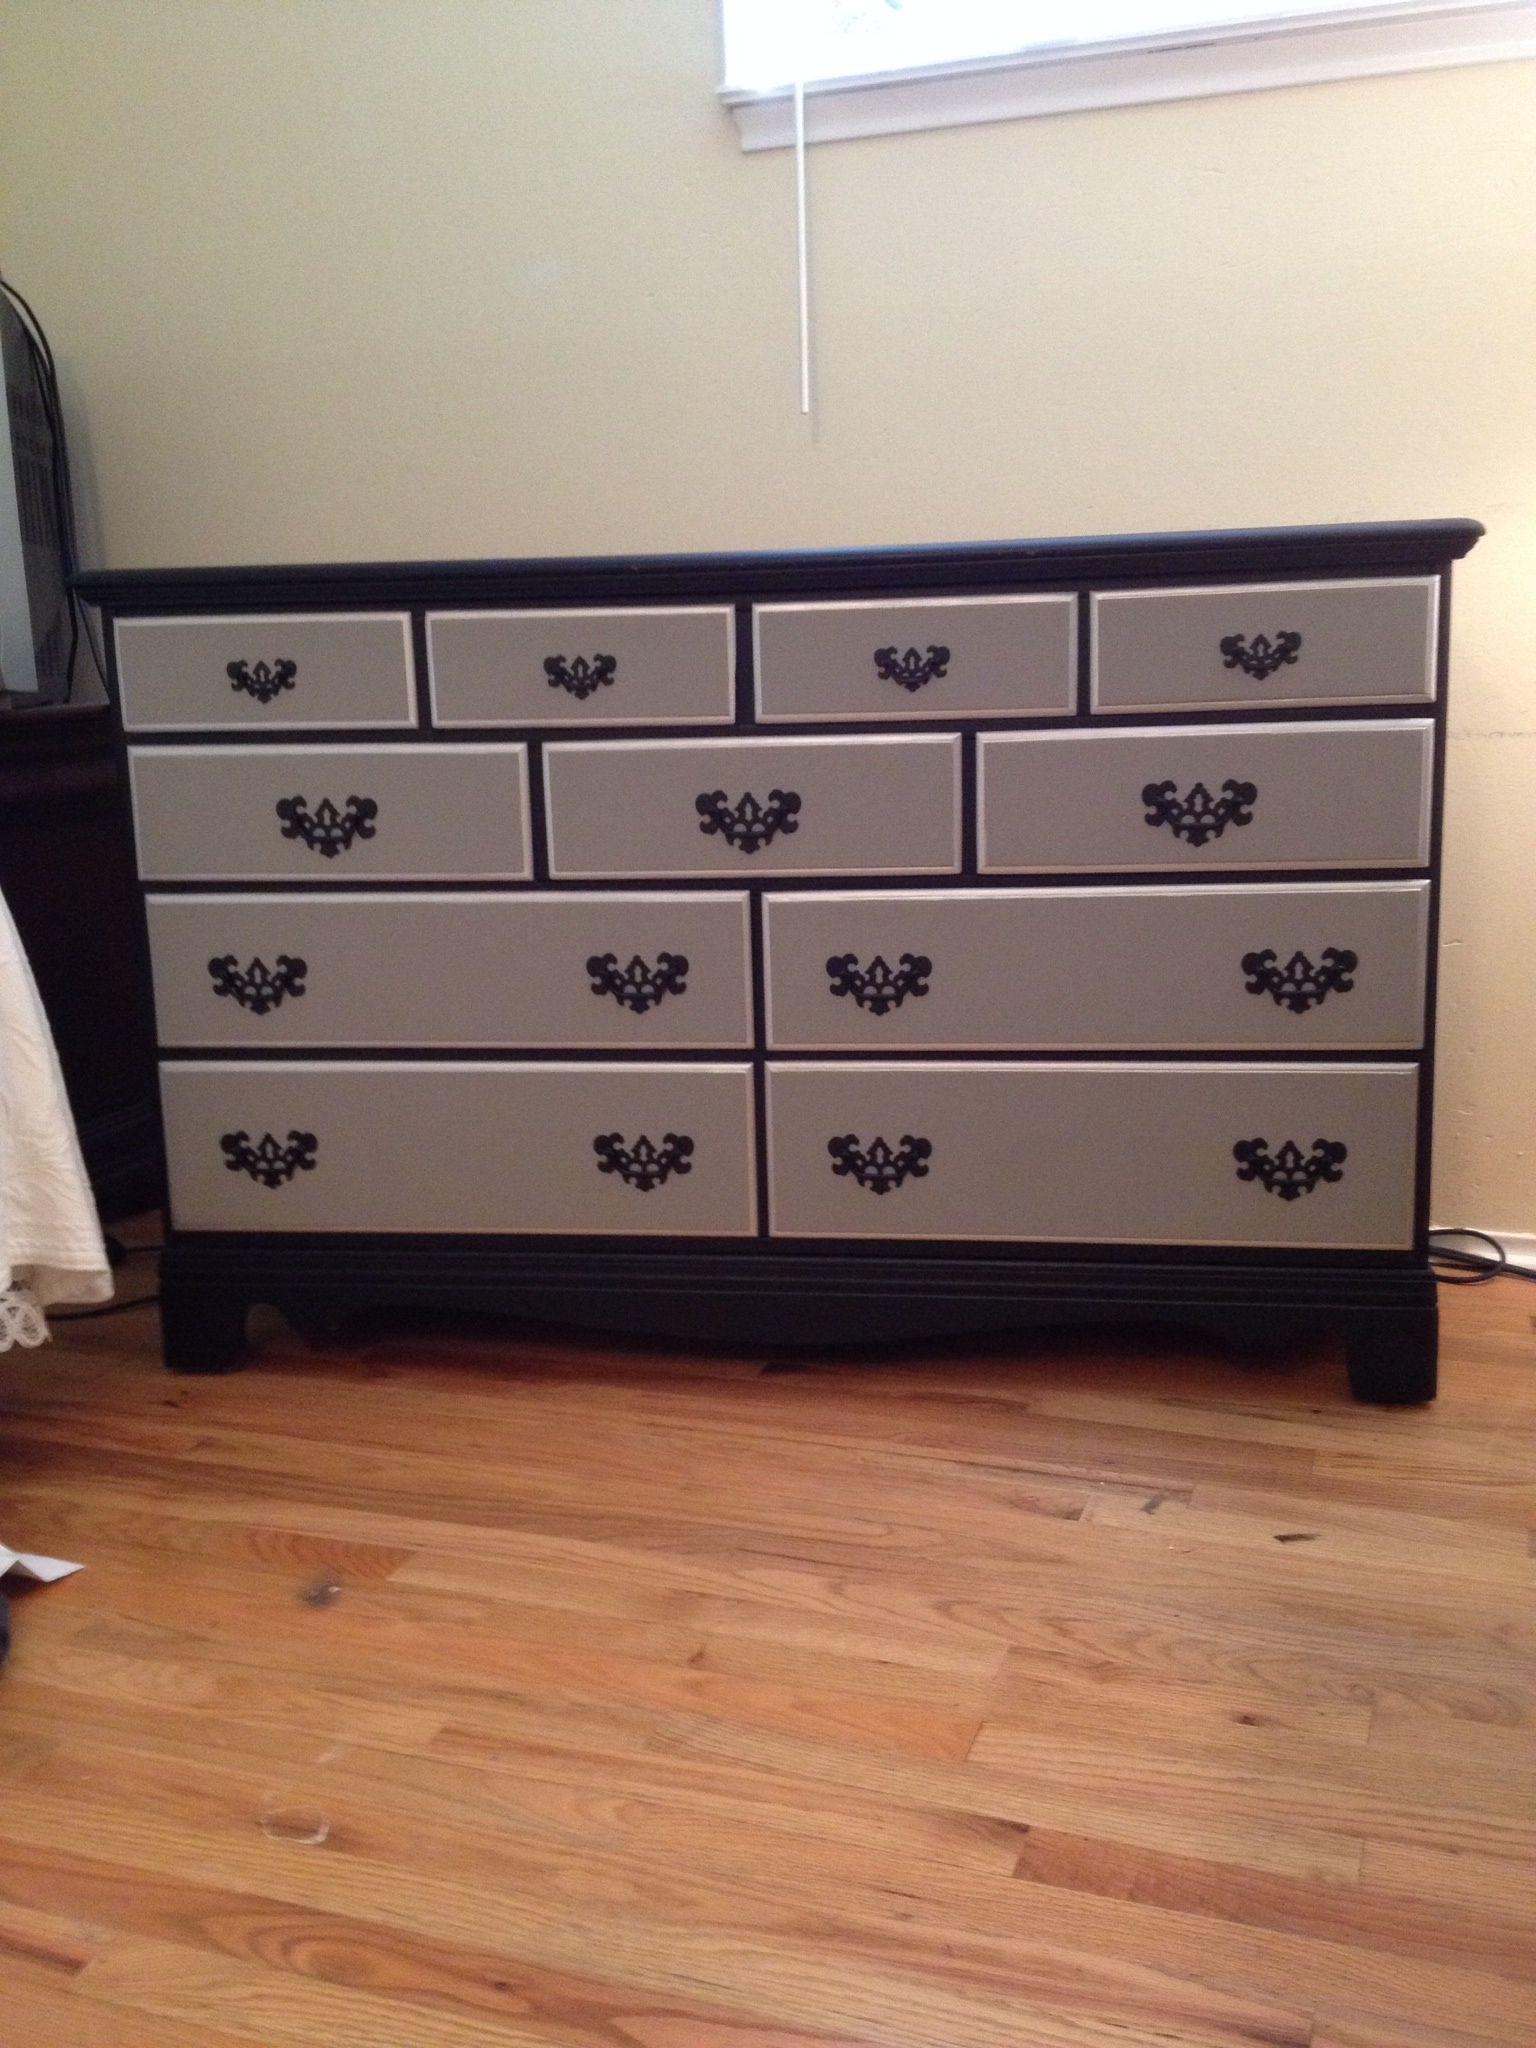 New Dresser To Match My Night Stands Black Matt Grey And A Shiny